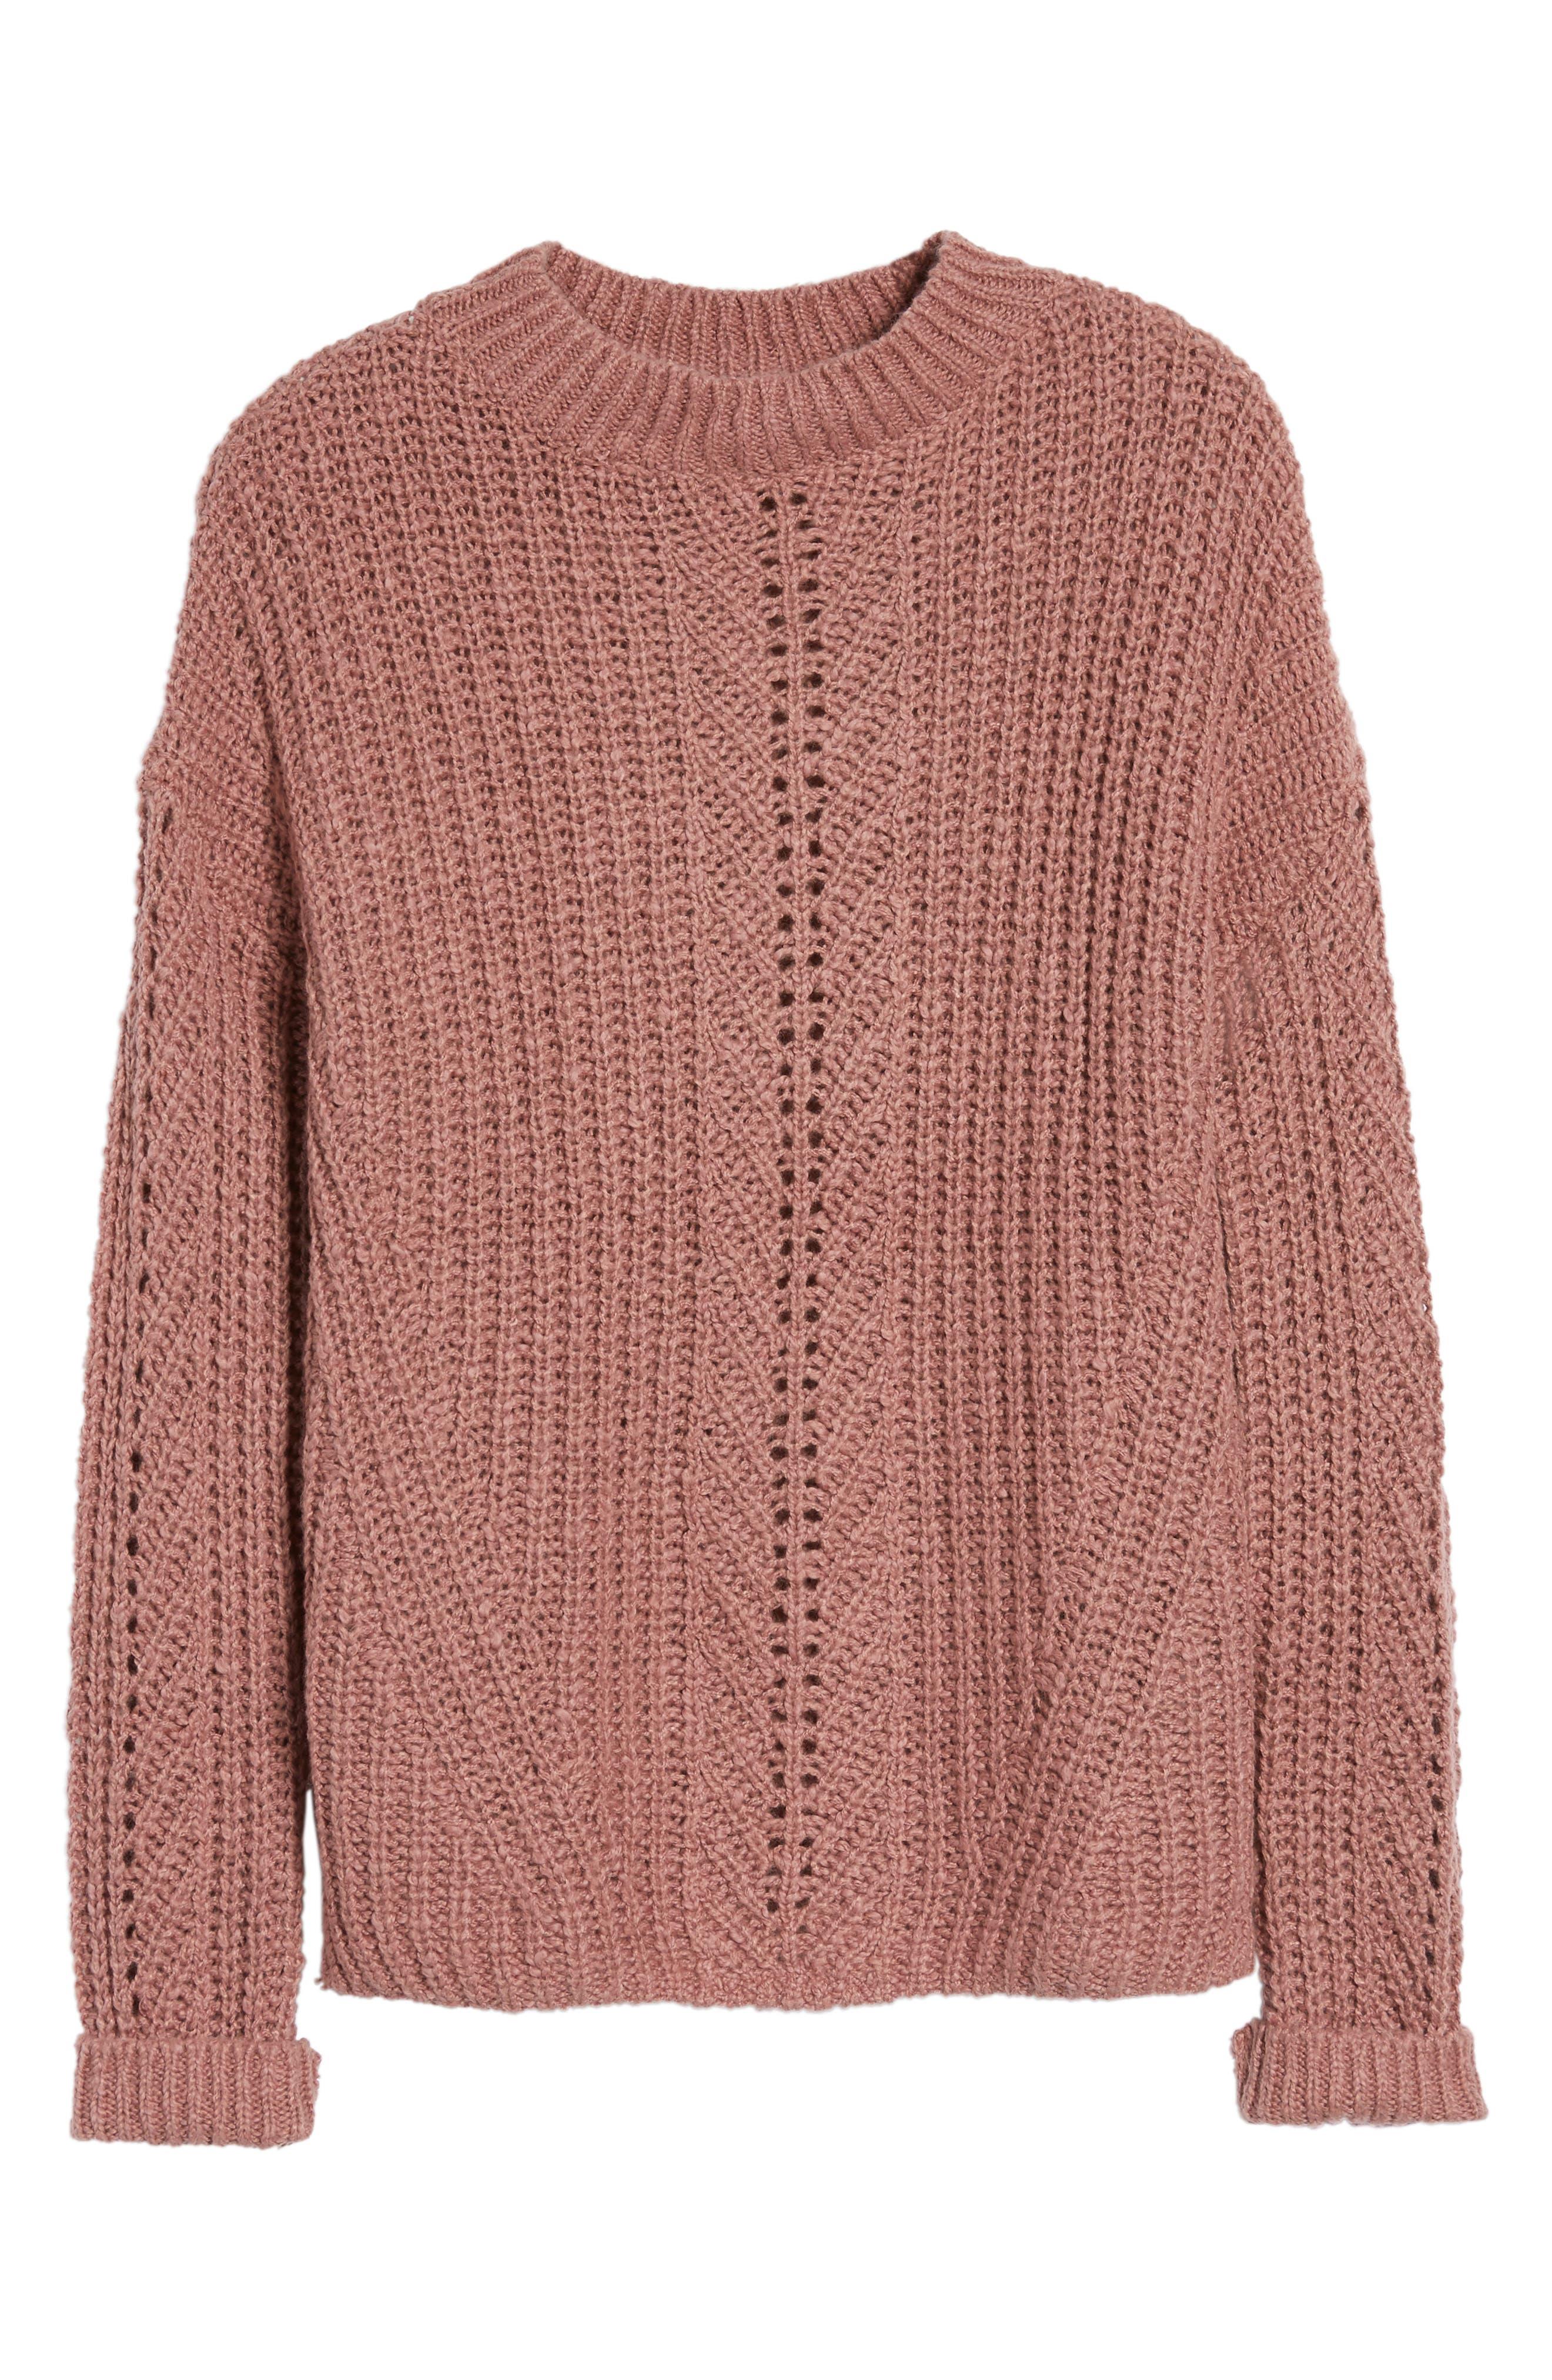 Main Image - Lucky Brand Open Stitch Sweater